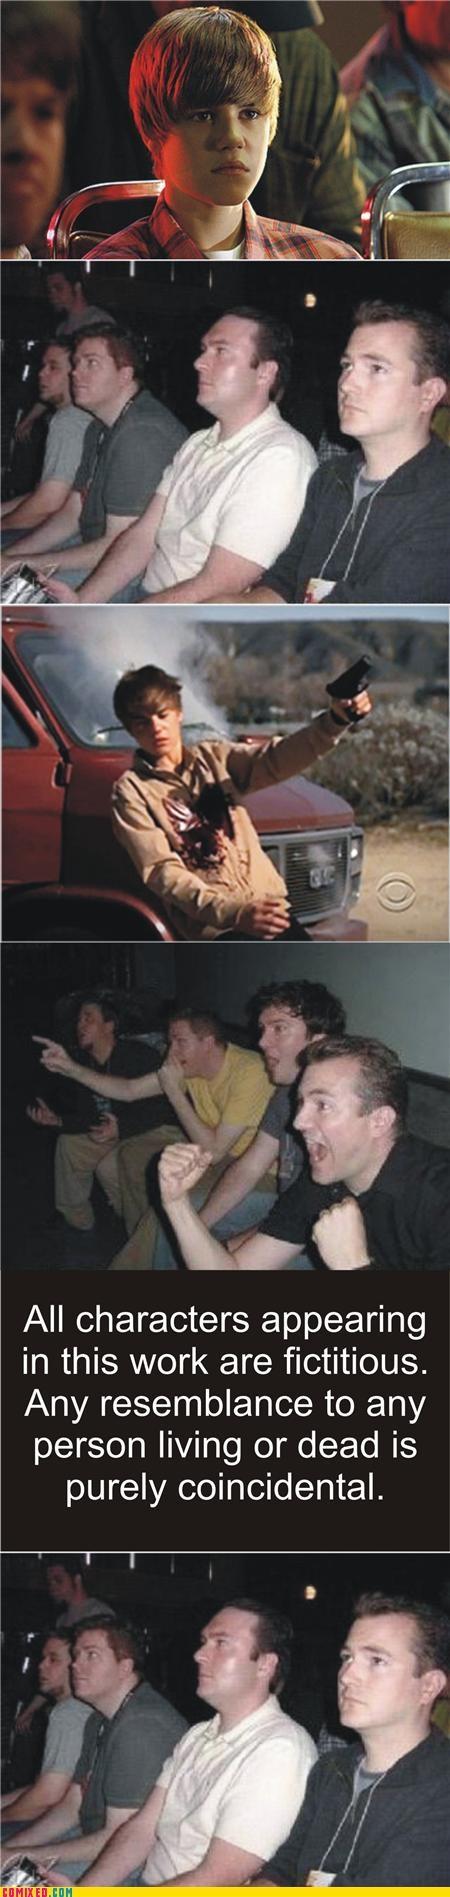 csi guns justin beiber reaction guys sad but true - 4482369280